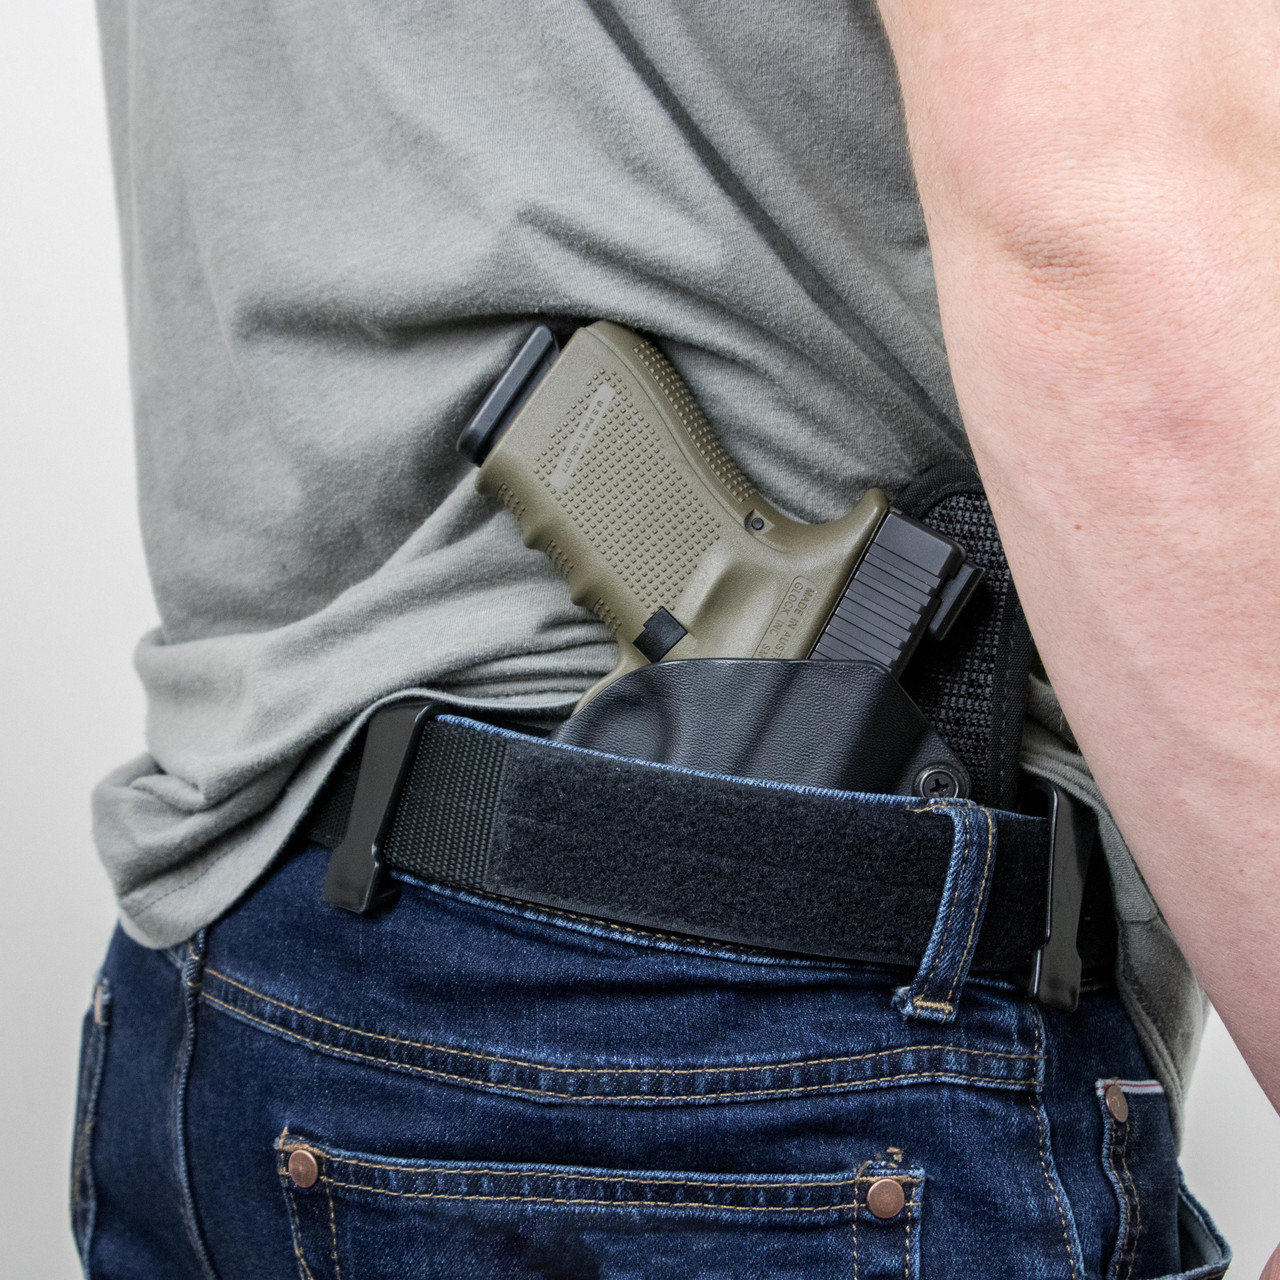 Glock G19/G23/G32/G45 w/Olight PL-Mini Valkyrie Mini Ventcore® Holster